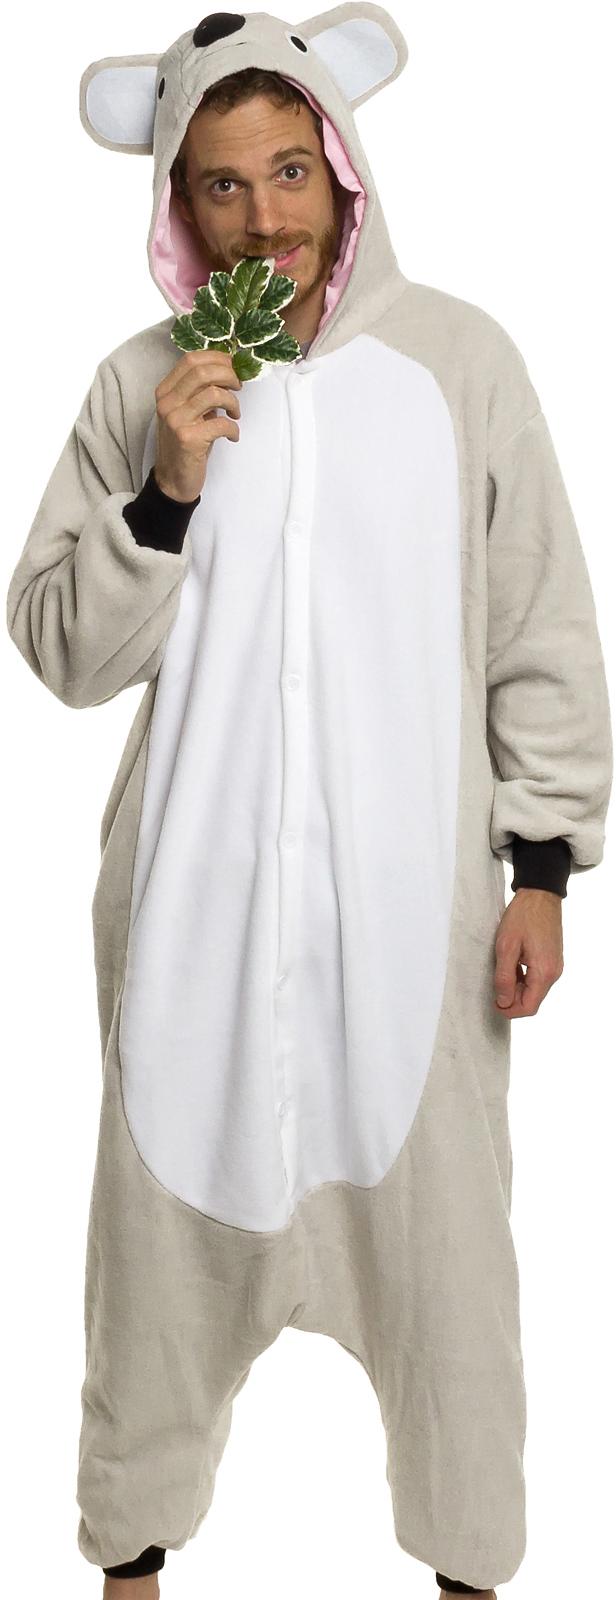 Silver Lilly Unisex Adult Pajamas - Plush One Piece Cosplay Koala Animal  Costume Sc 1 St Walmart 801c9c28e